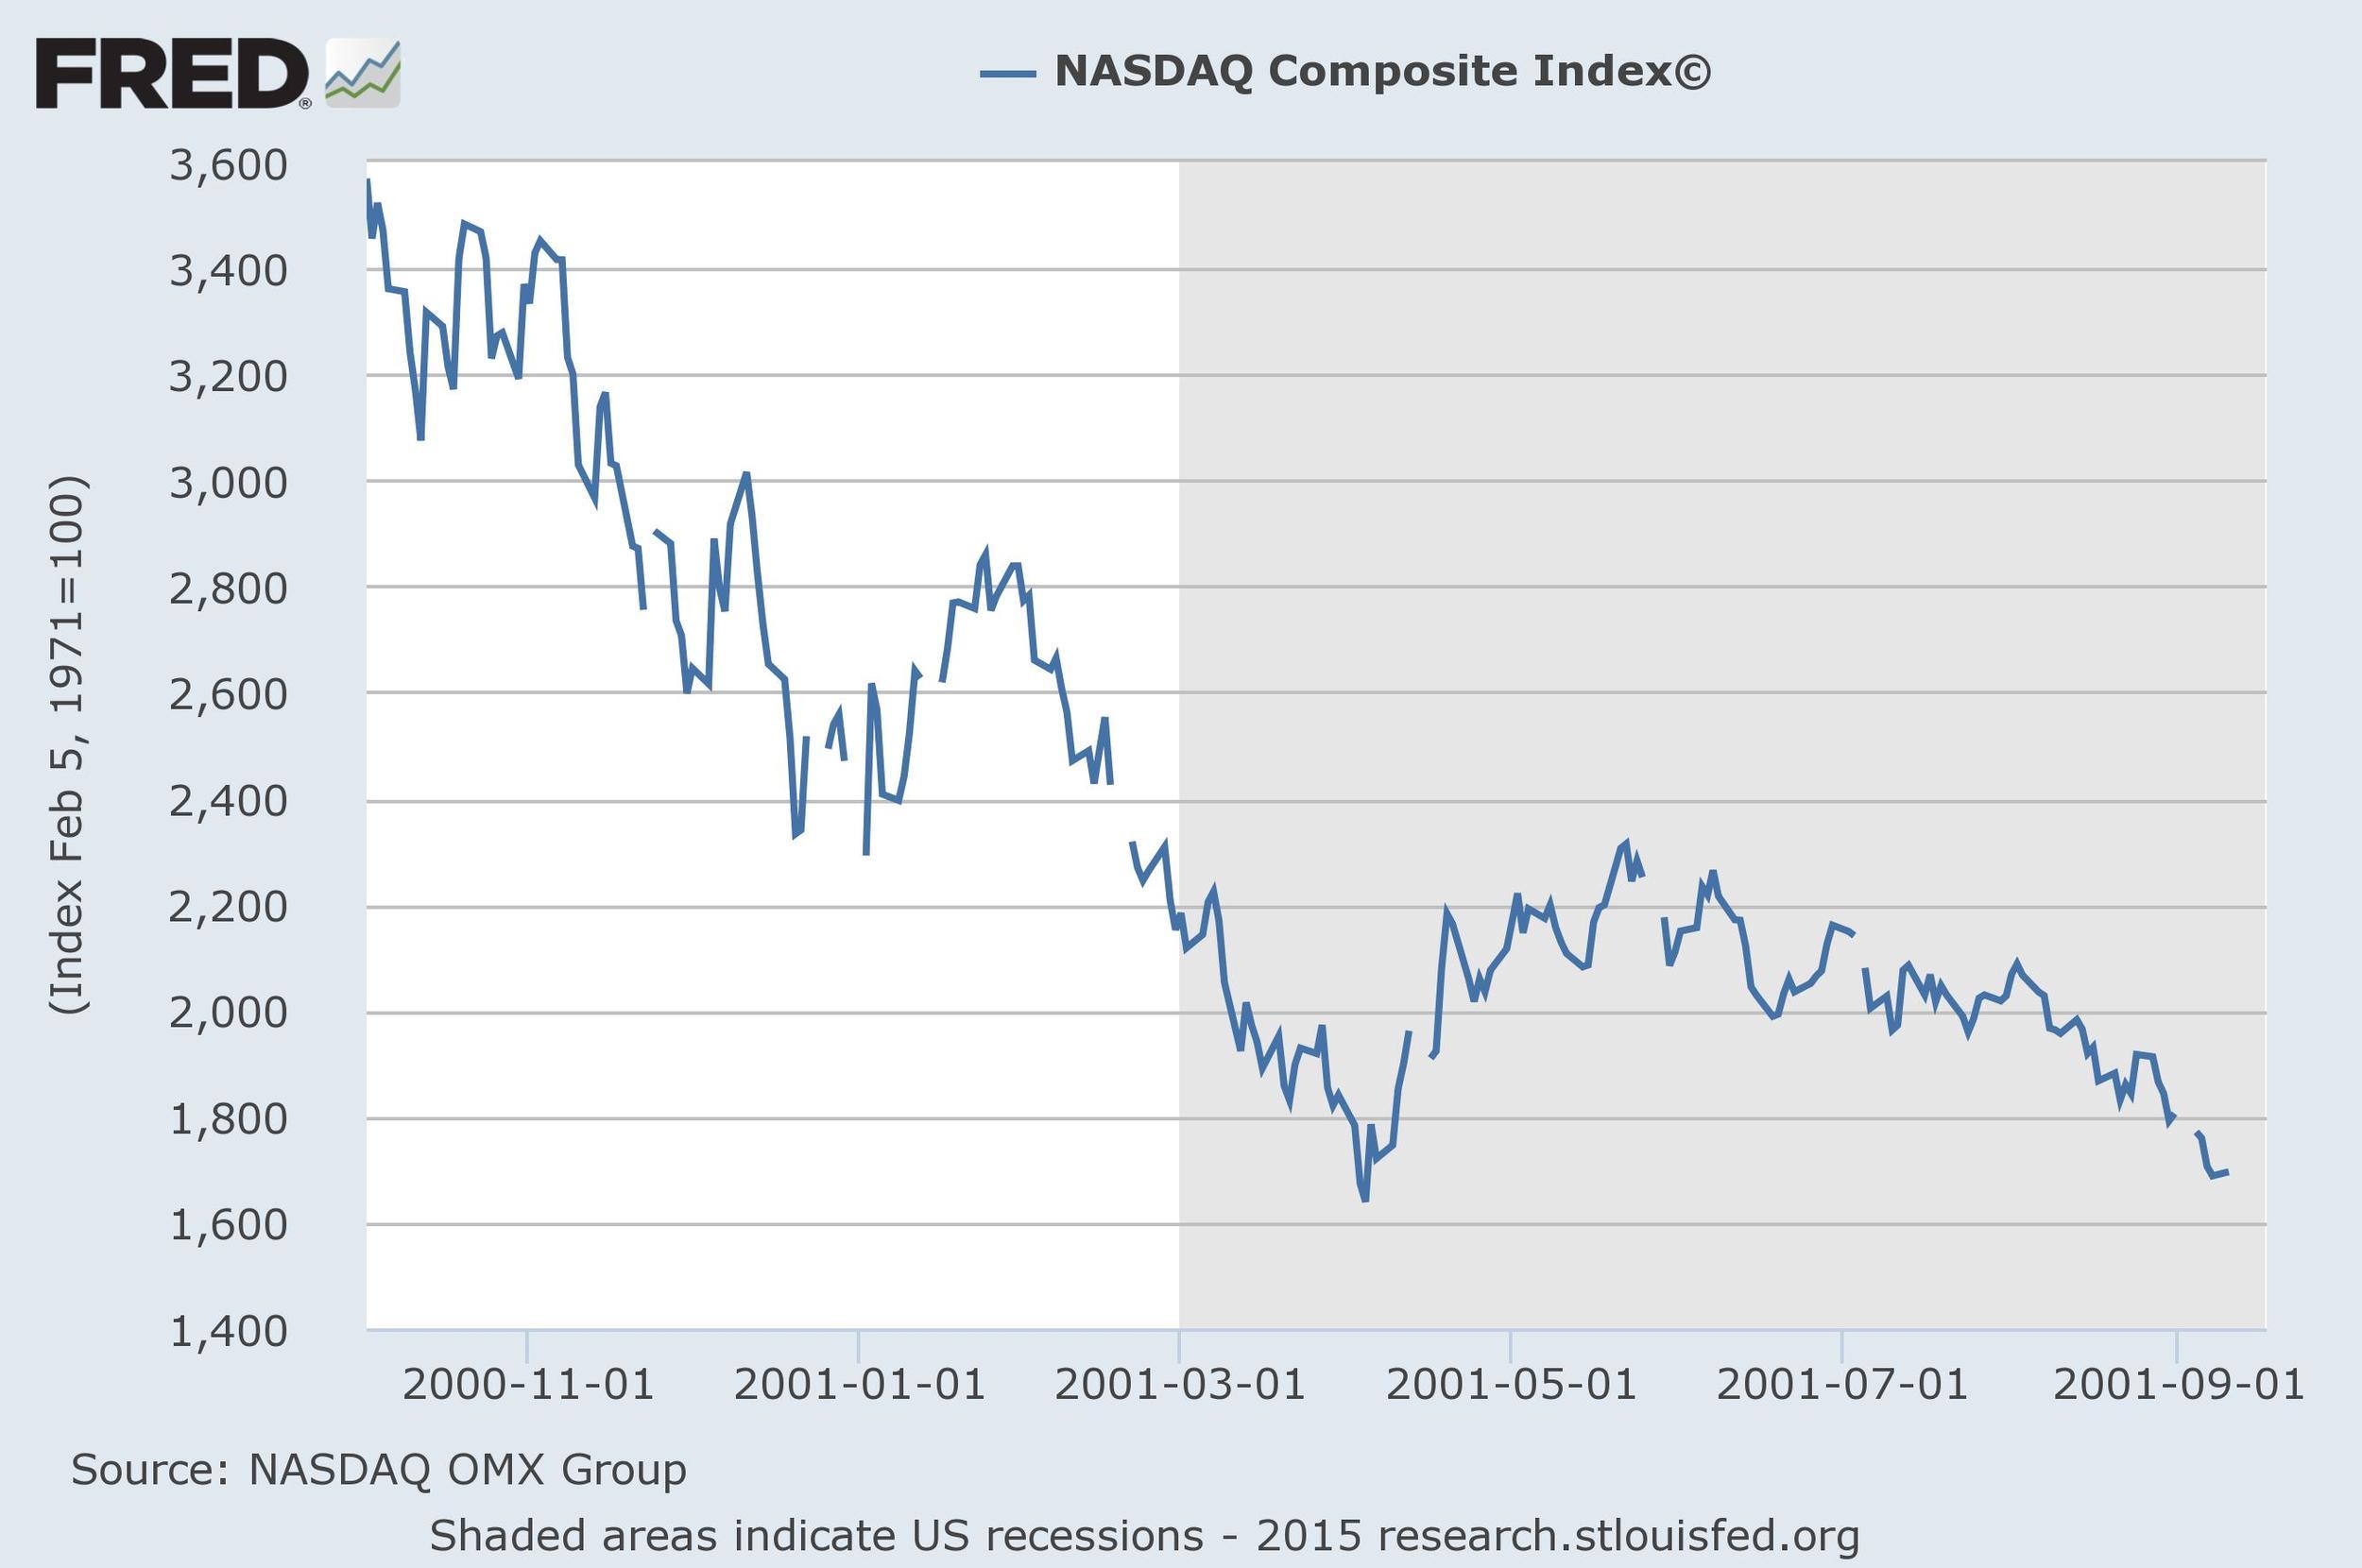 source: NASDAQ OMX Group, St. Louis Fed